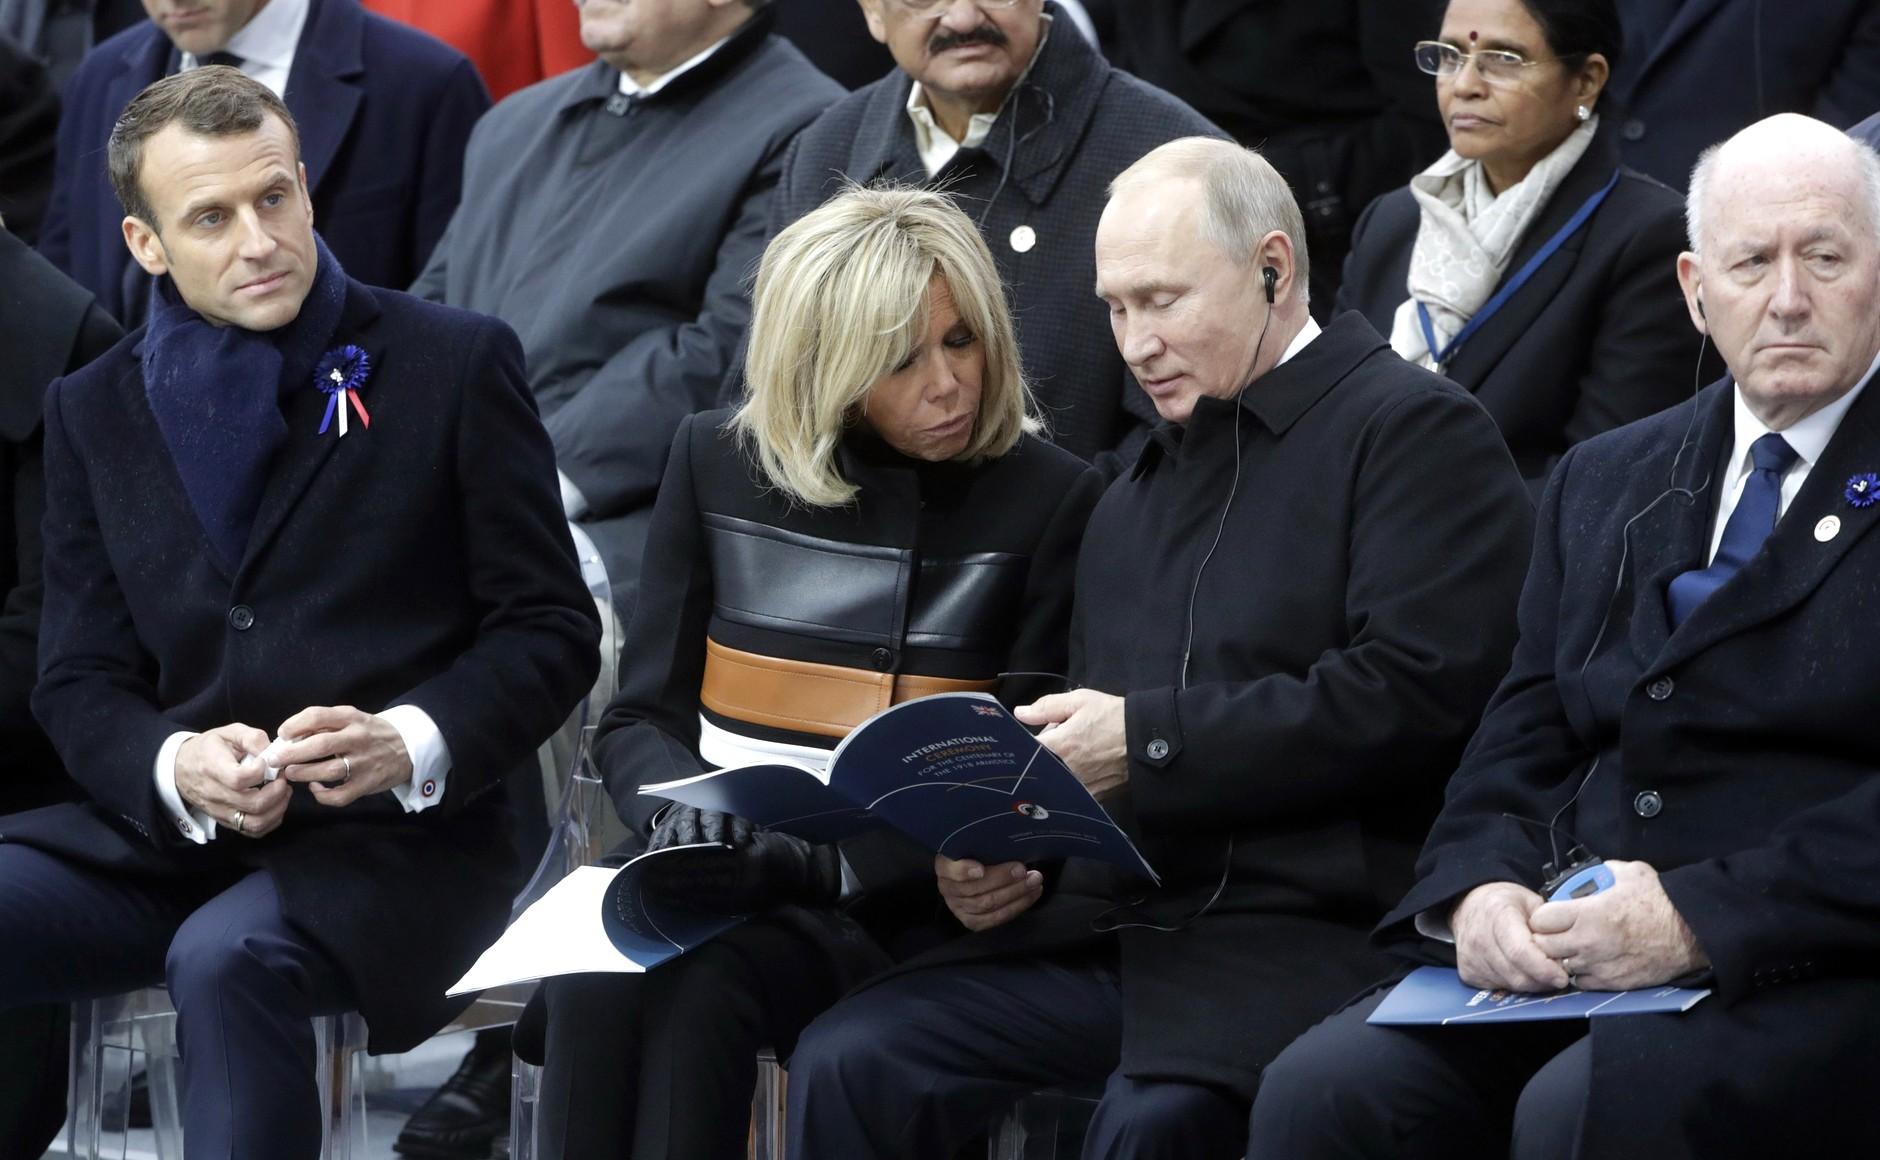 File:Emmanuel and Brigitte Macron & Vladimir Putin.jpg - Wikimedia Commons